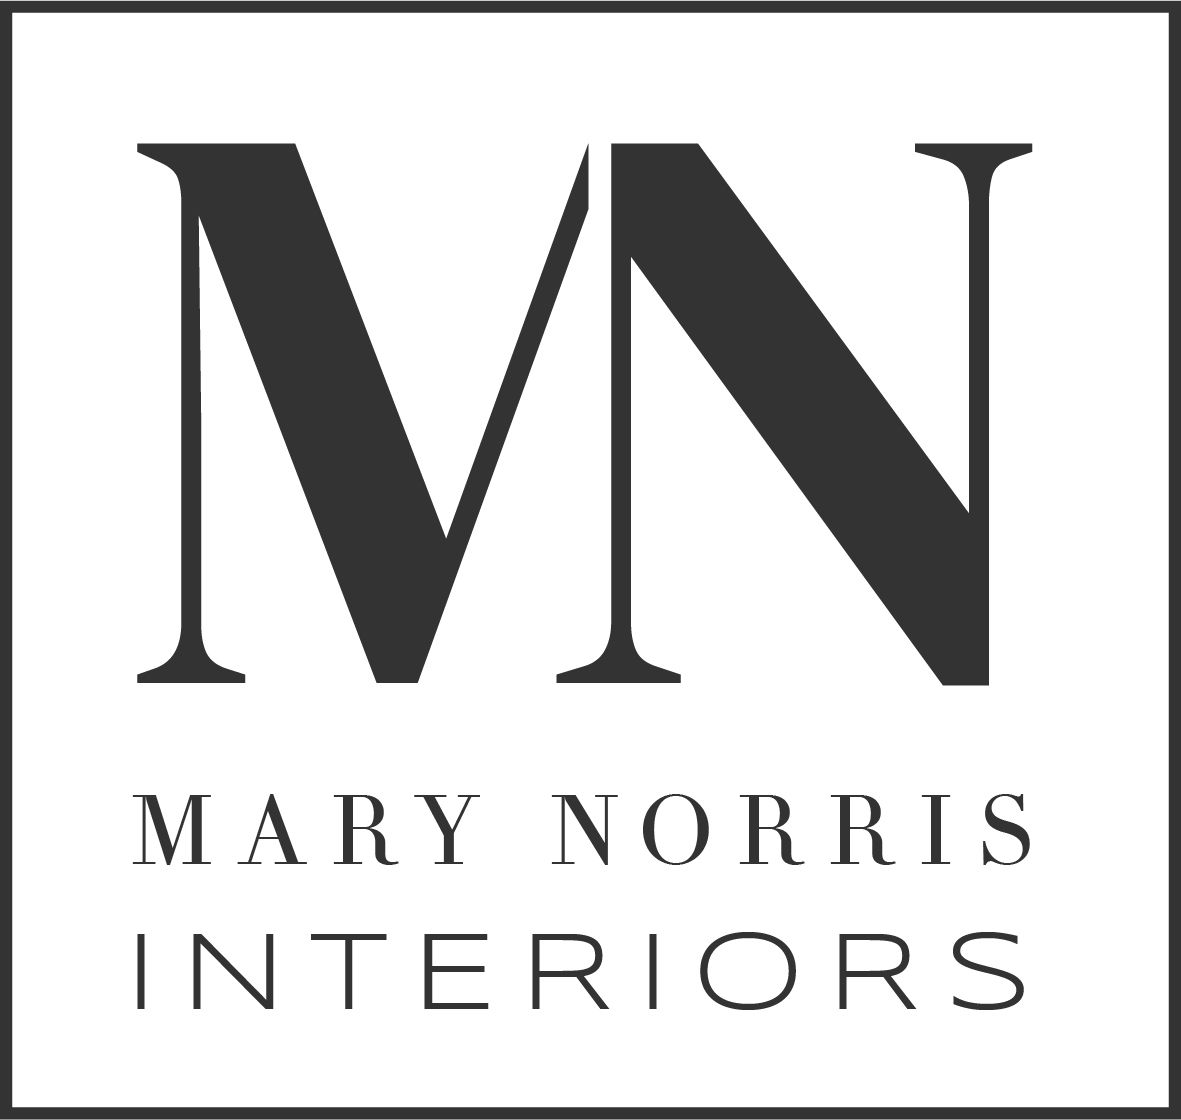 Mary Norris Interiors